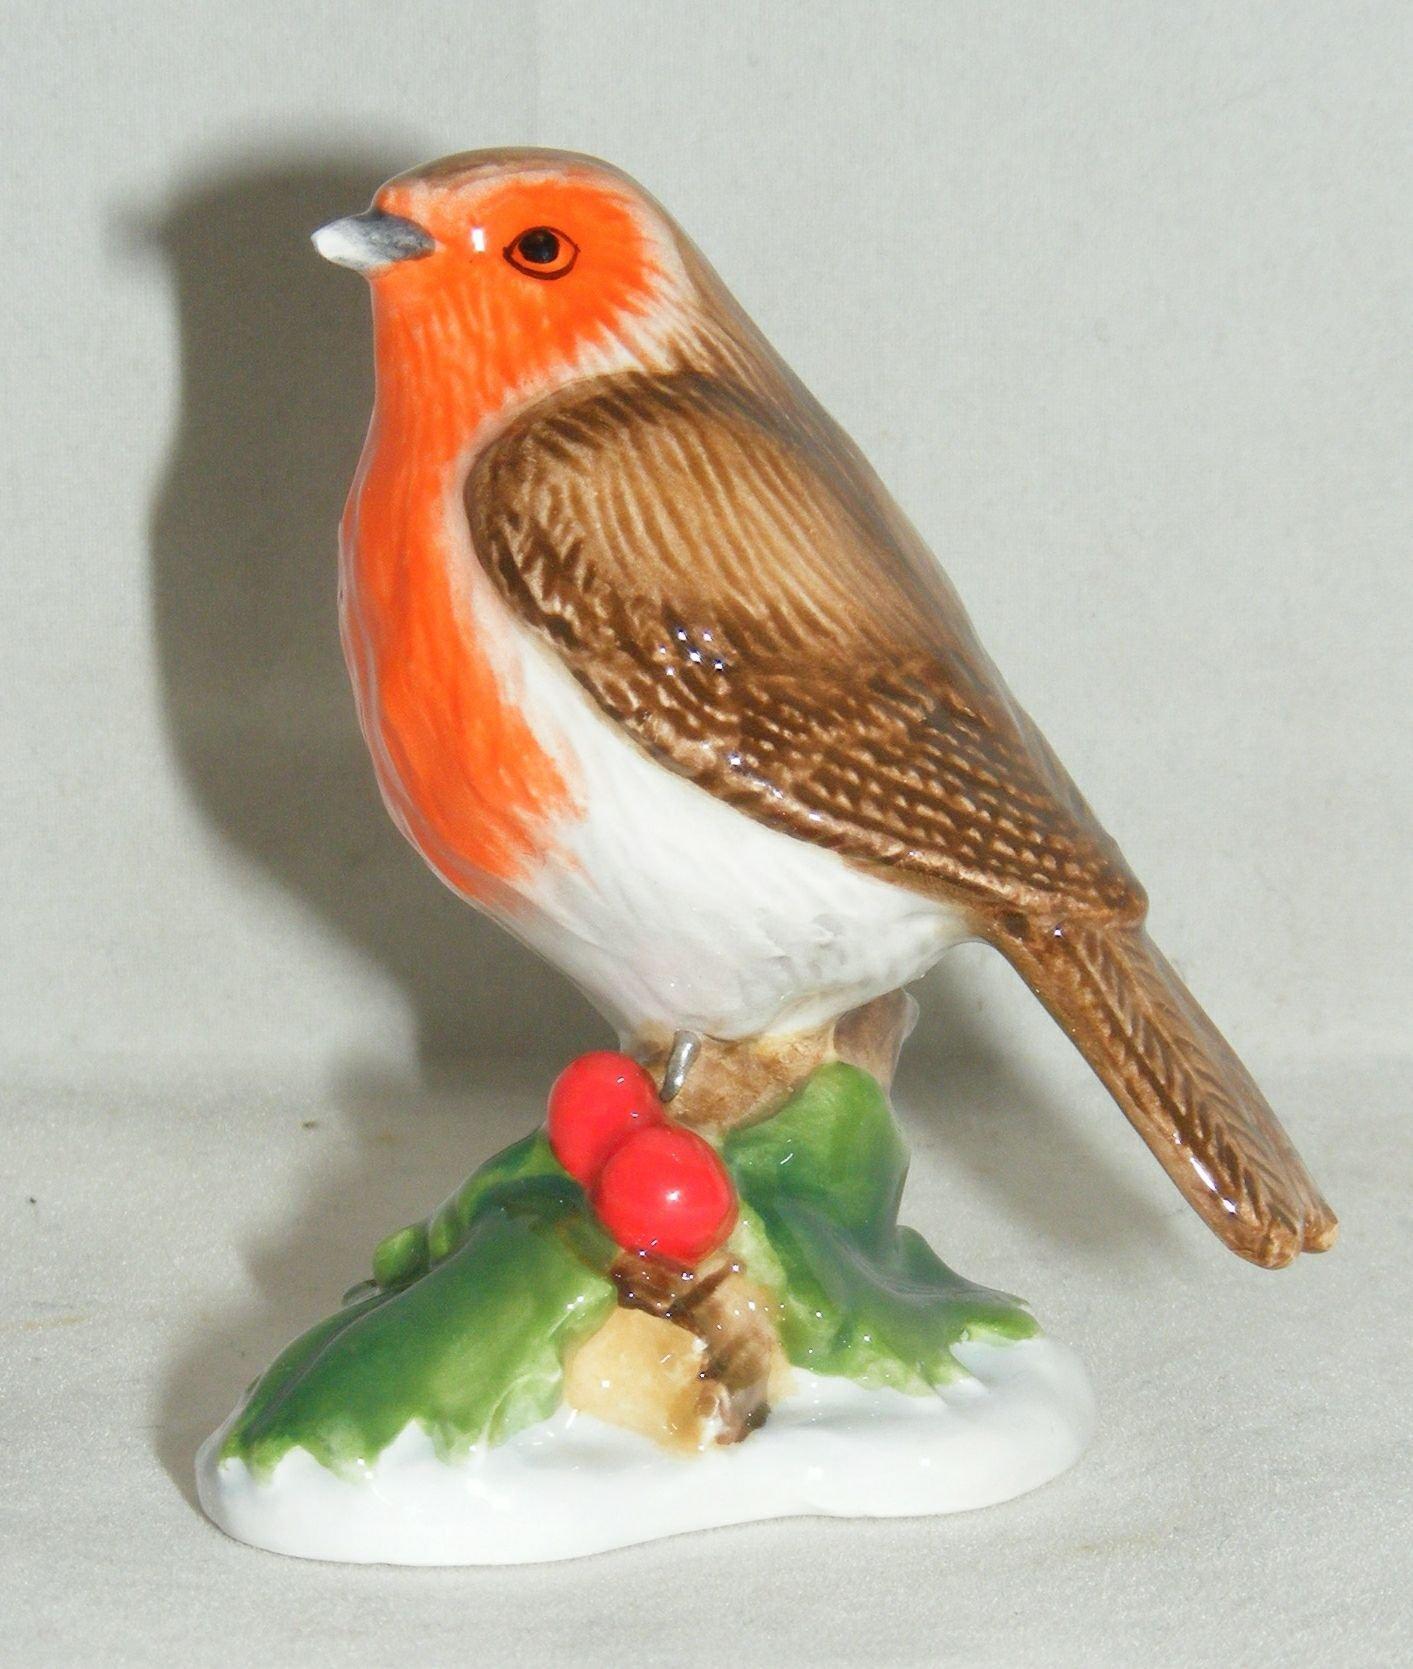 John Beswick JBDB19 Trumpeter Swan Bird Figurine